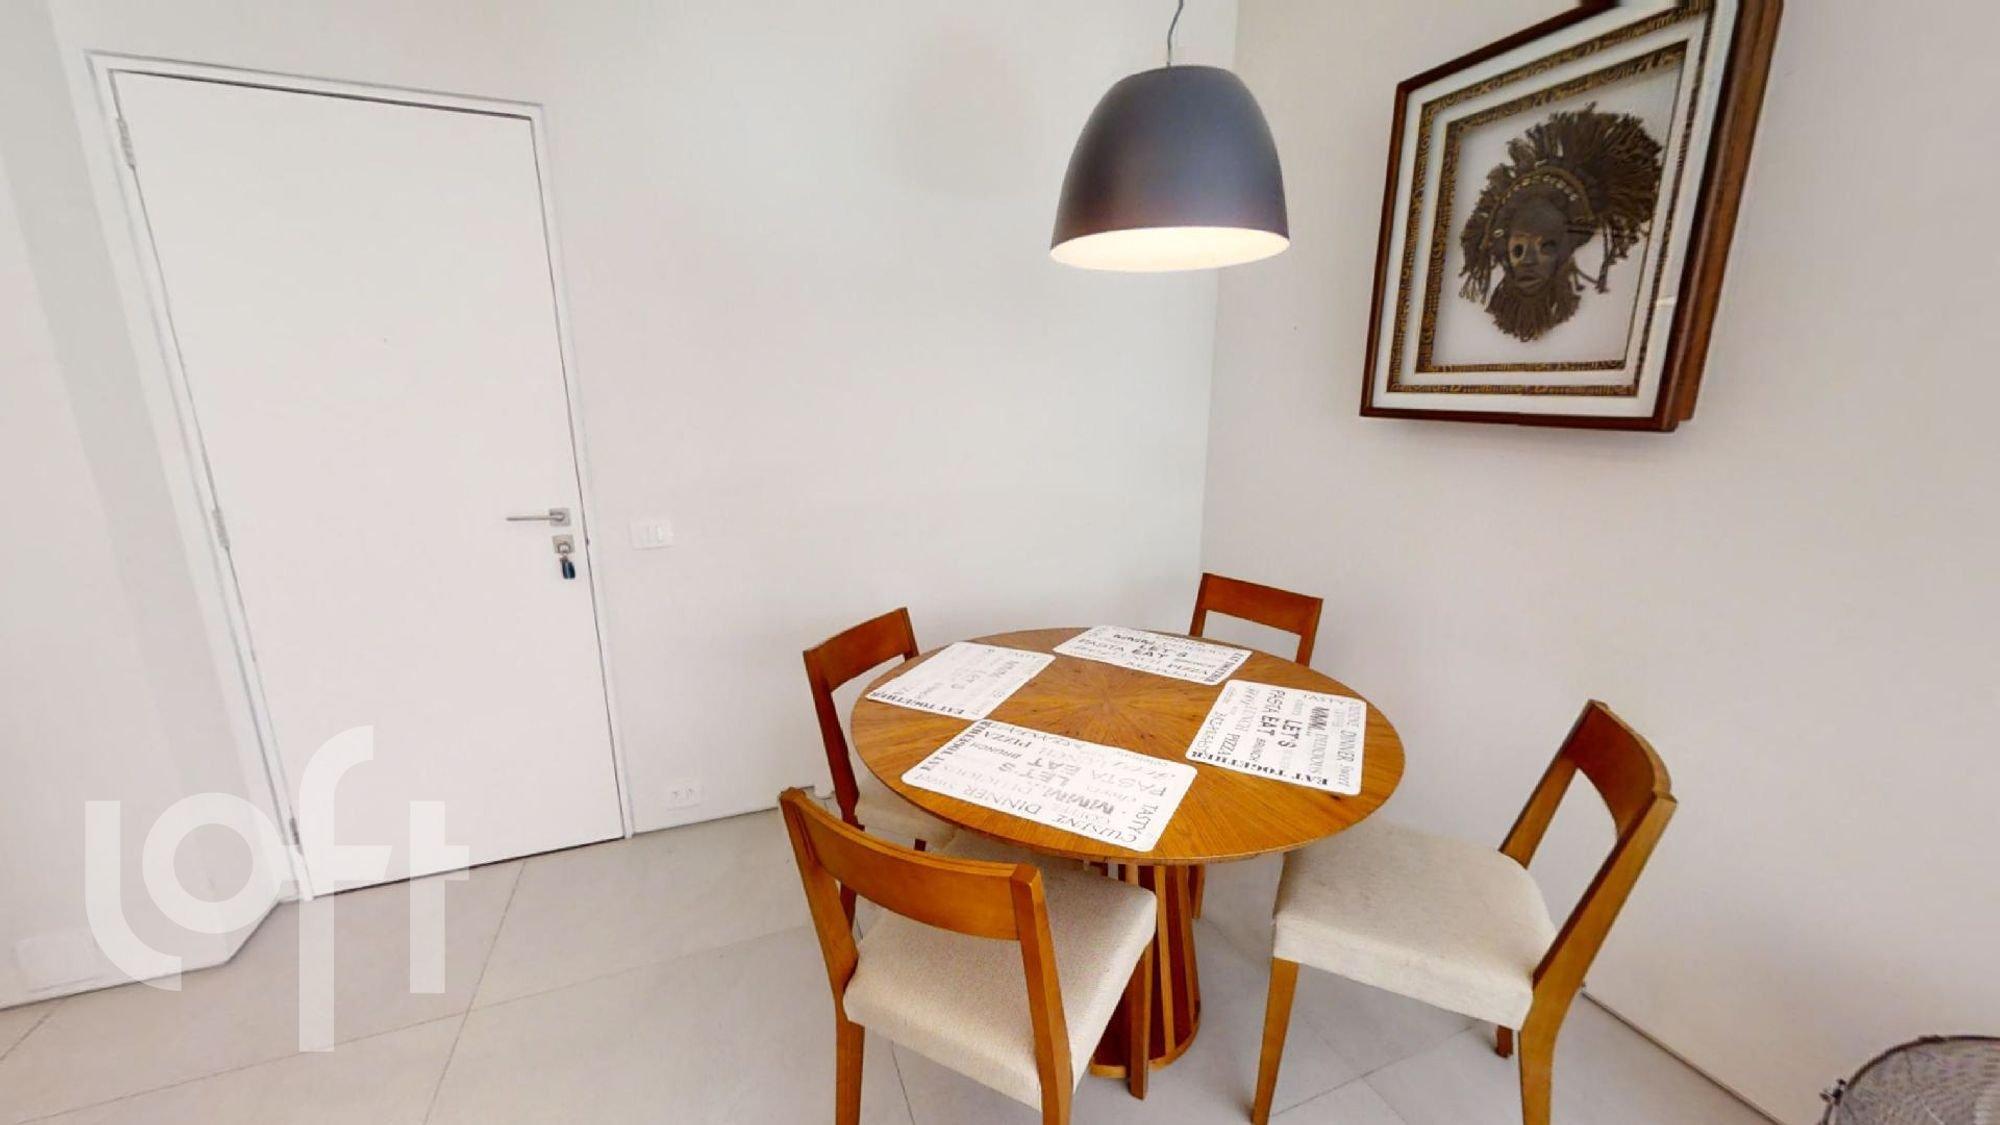 Foto de Hall com cadeira, mesa de jantar